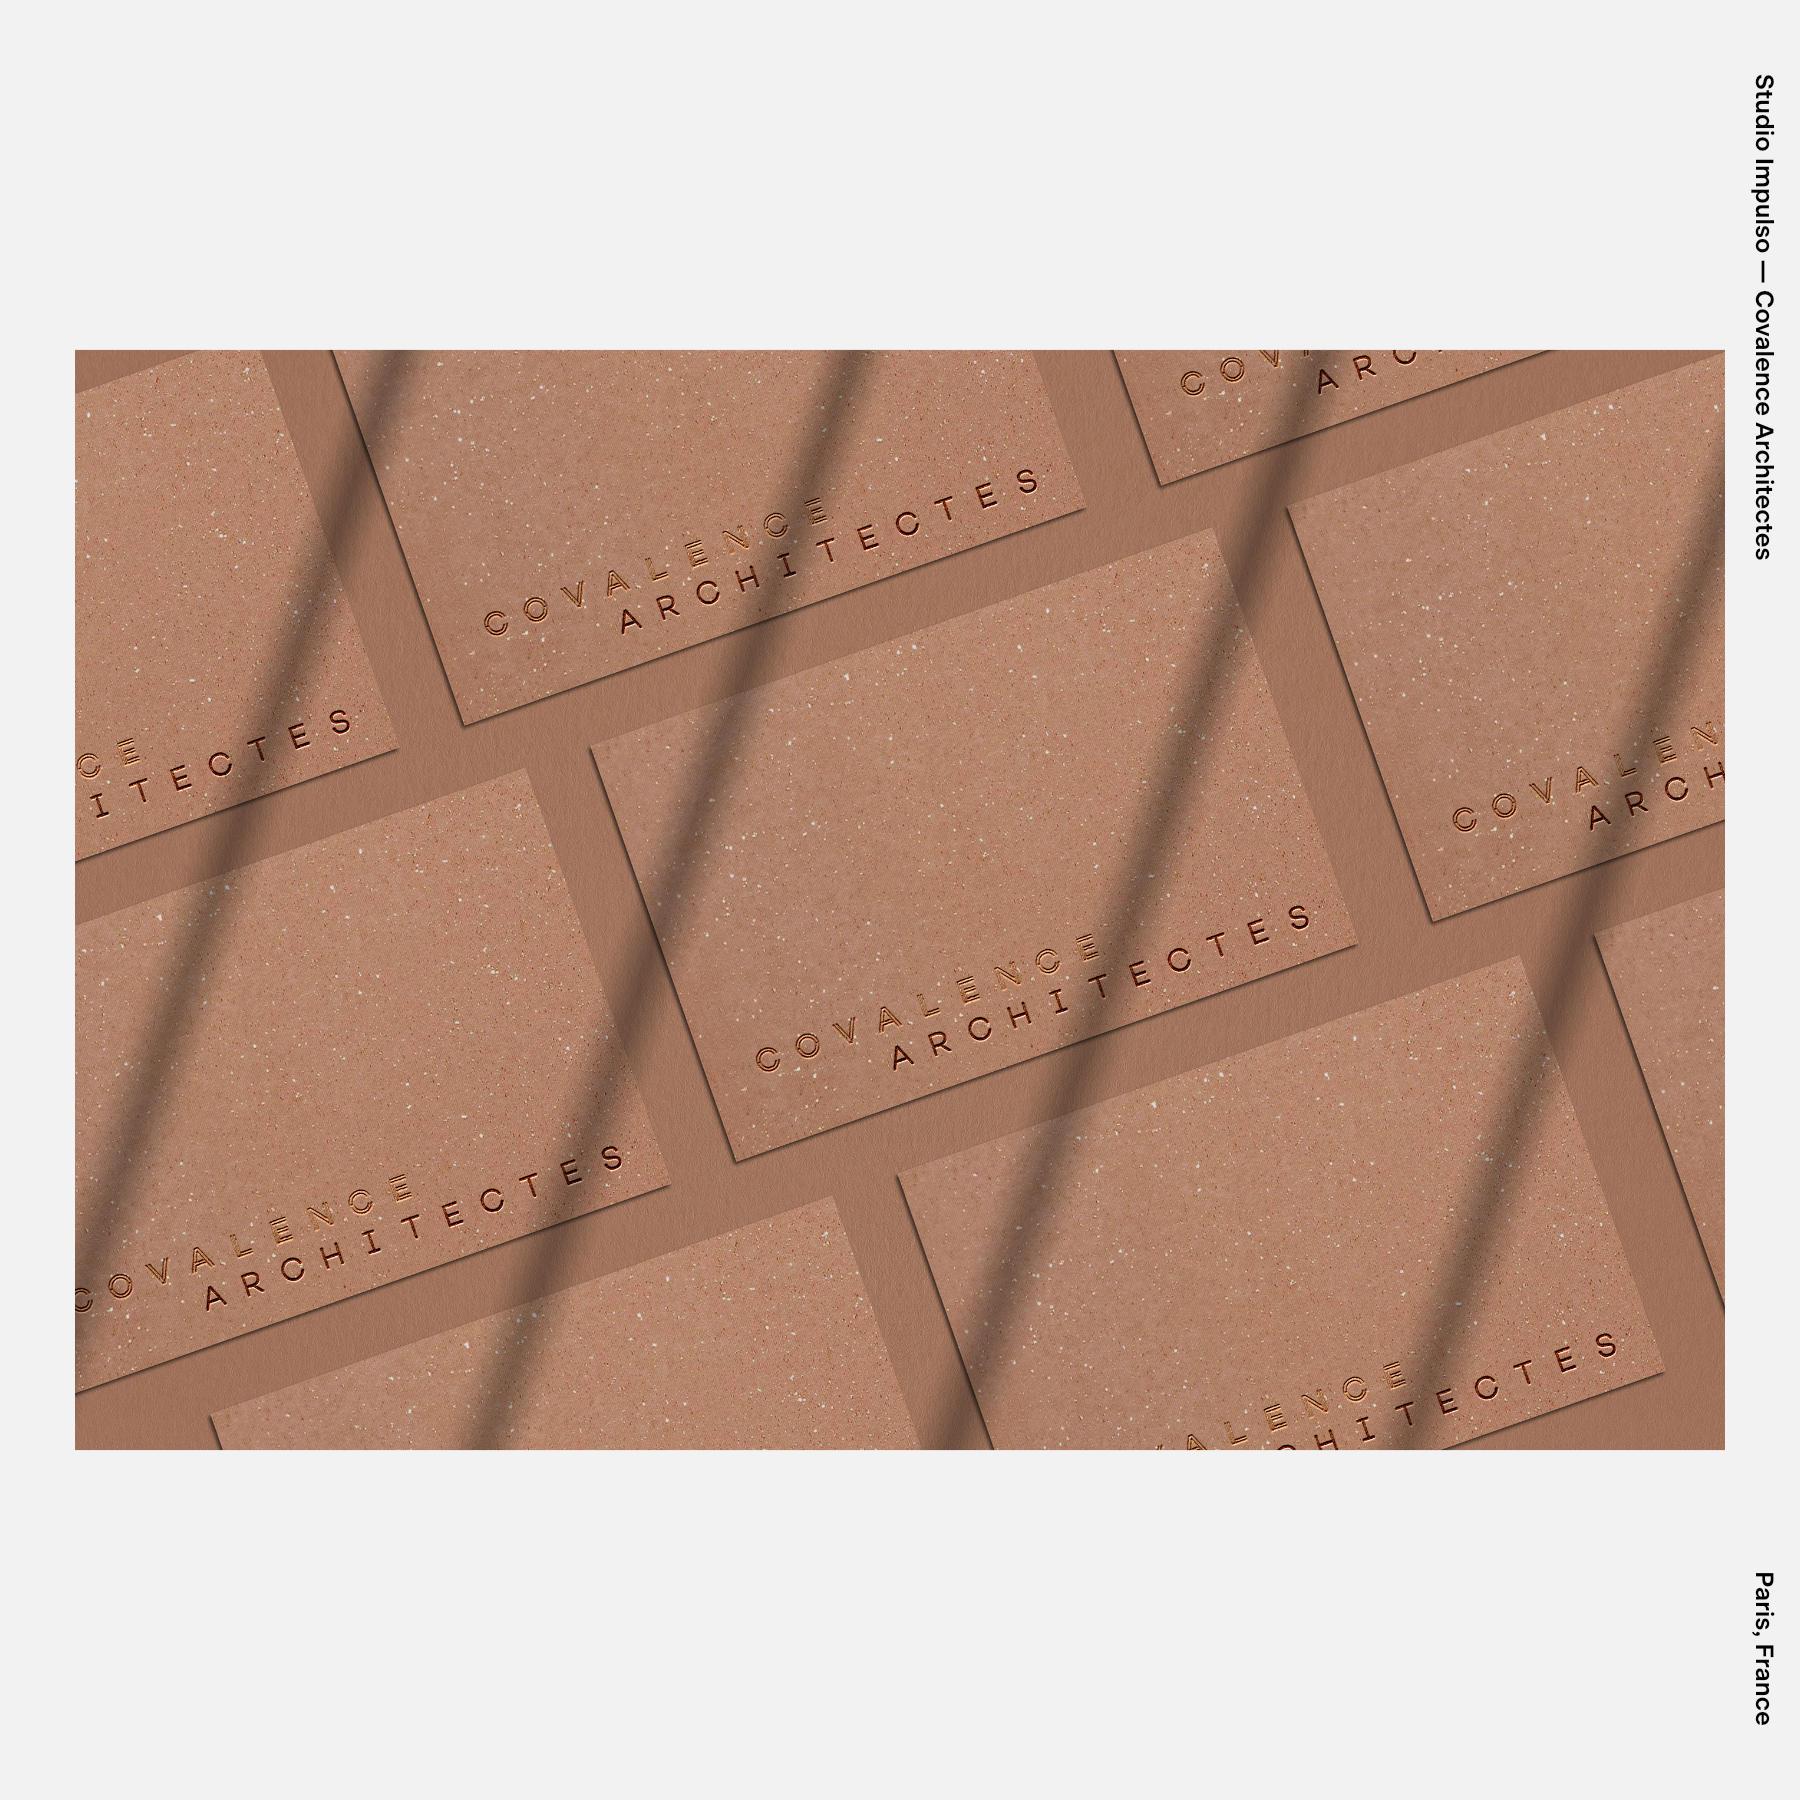 Studio Impulso — Covalence Architectes